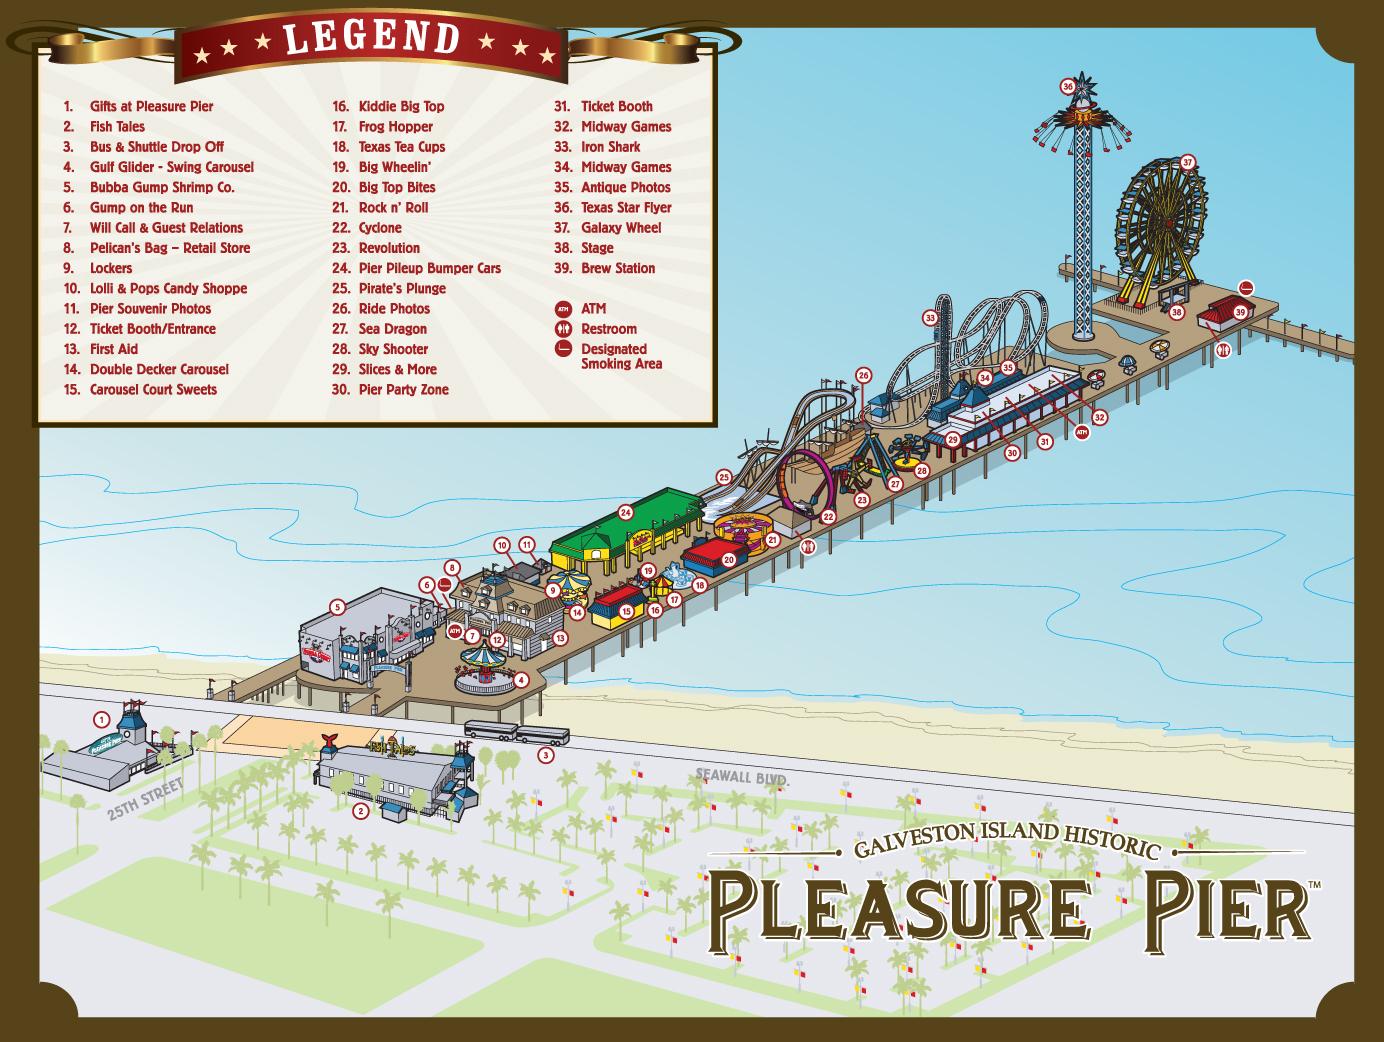 Galveston Island Historic Pleasure Pier Opens - Coaster101 on blank map of fredericksburg, blank map of dallas, blank map of atlanta, blank map of texas, blank map of charleston, blank map of cozumel, blank map of jacksonville, blank map of virginia beach, blank map of new orleans,